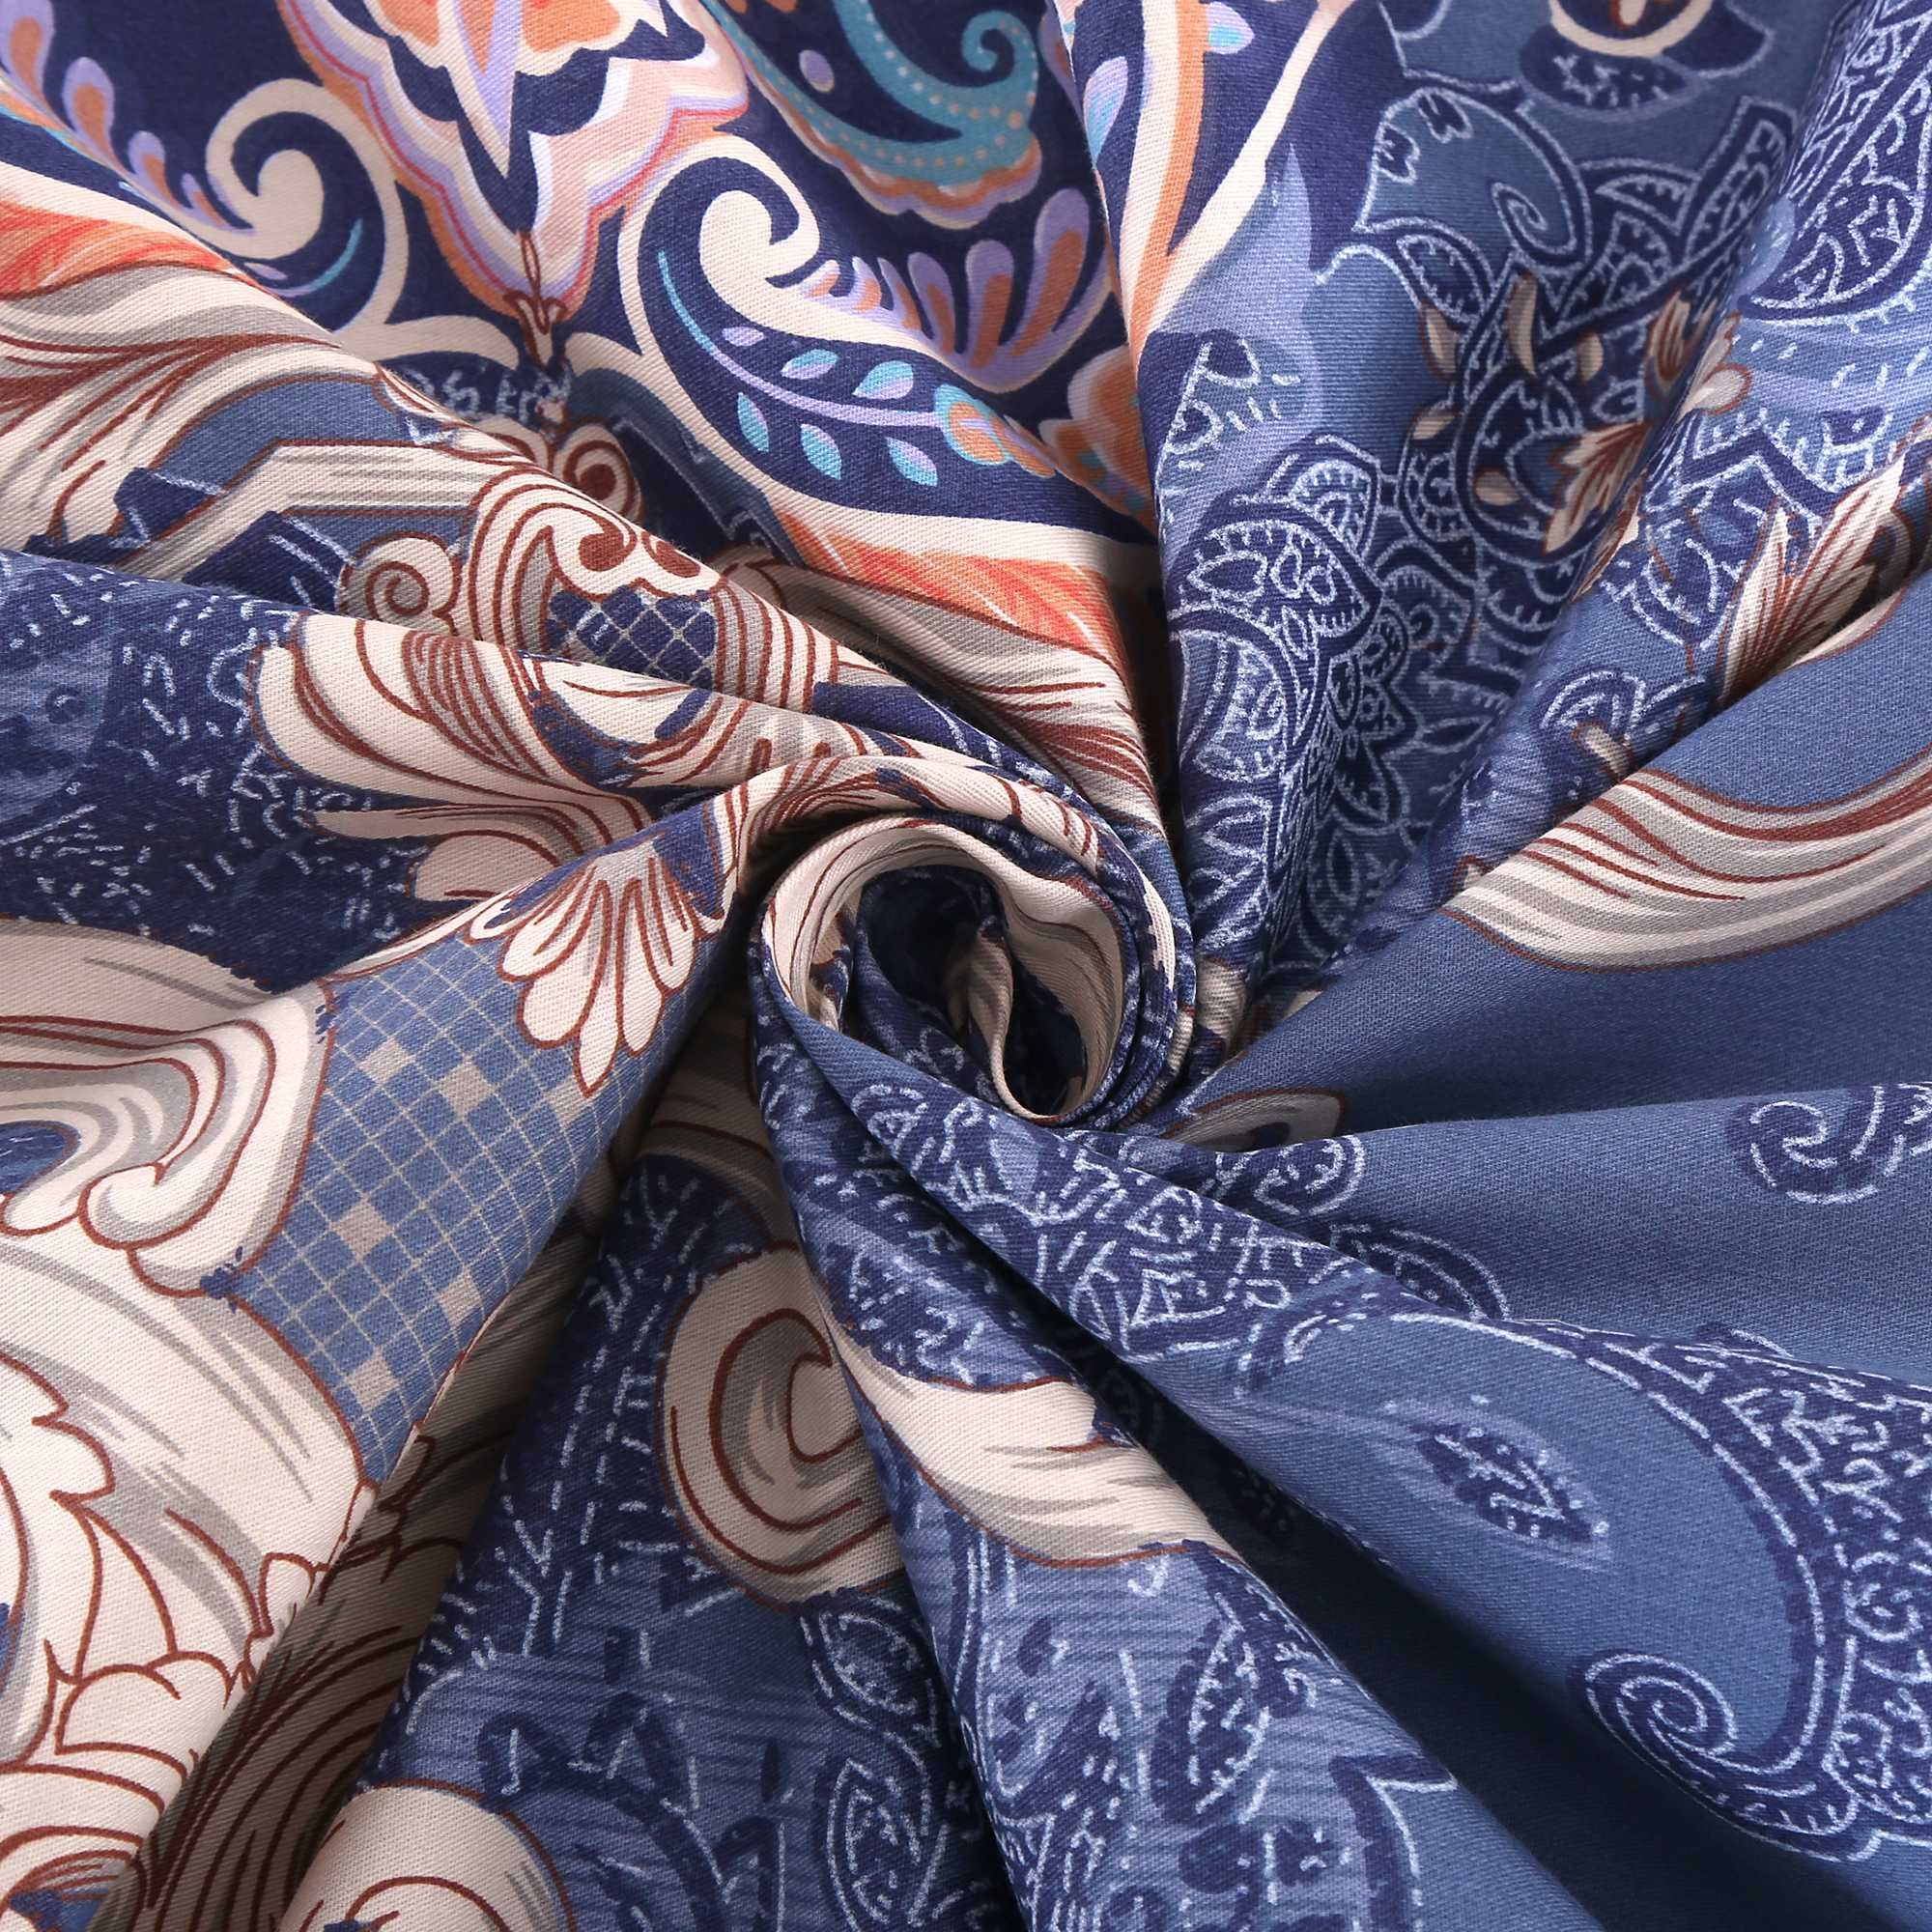 Alibasis Cotton Floral Pattern Bedding Quilt Set, 3-Piece Bohemian Style 100% Cotton Duvet Cover Set For Kids Bedroom Guestroom (90\